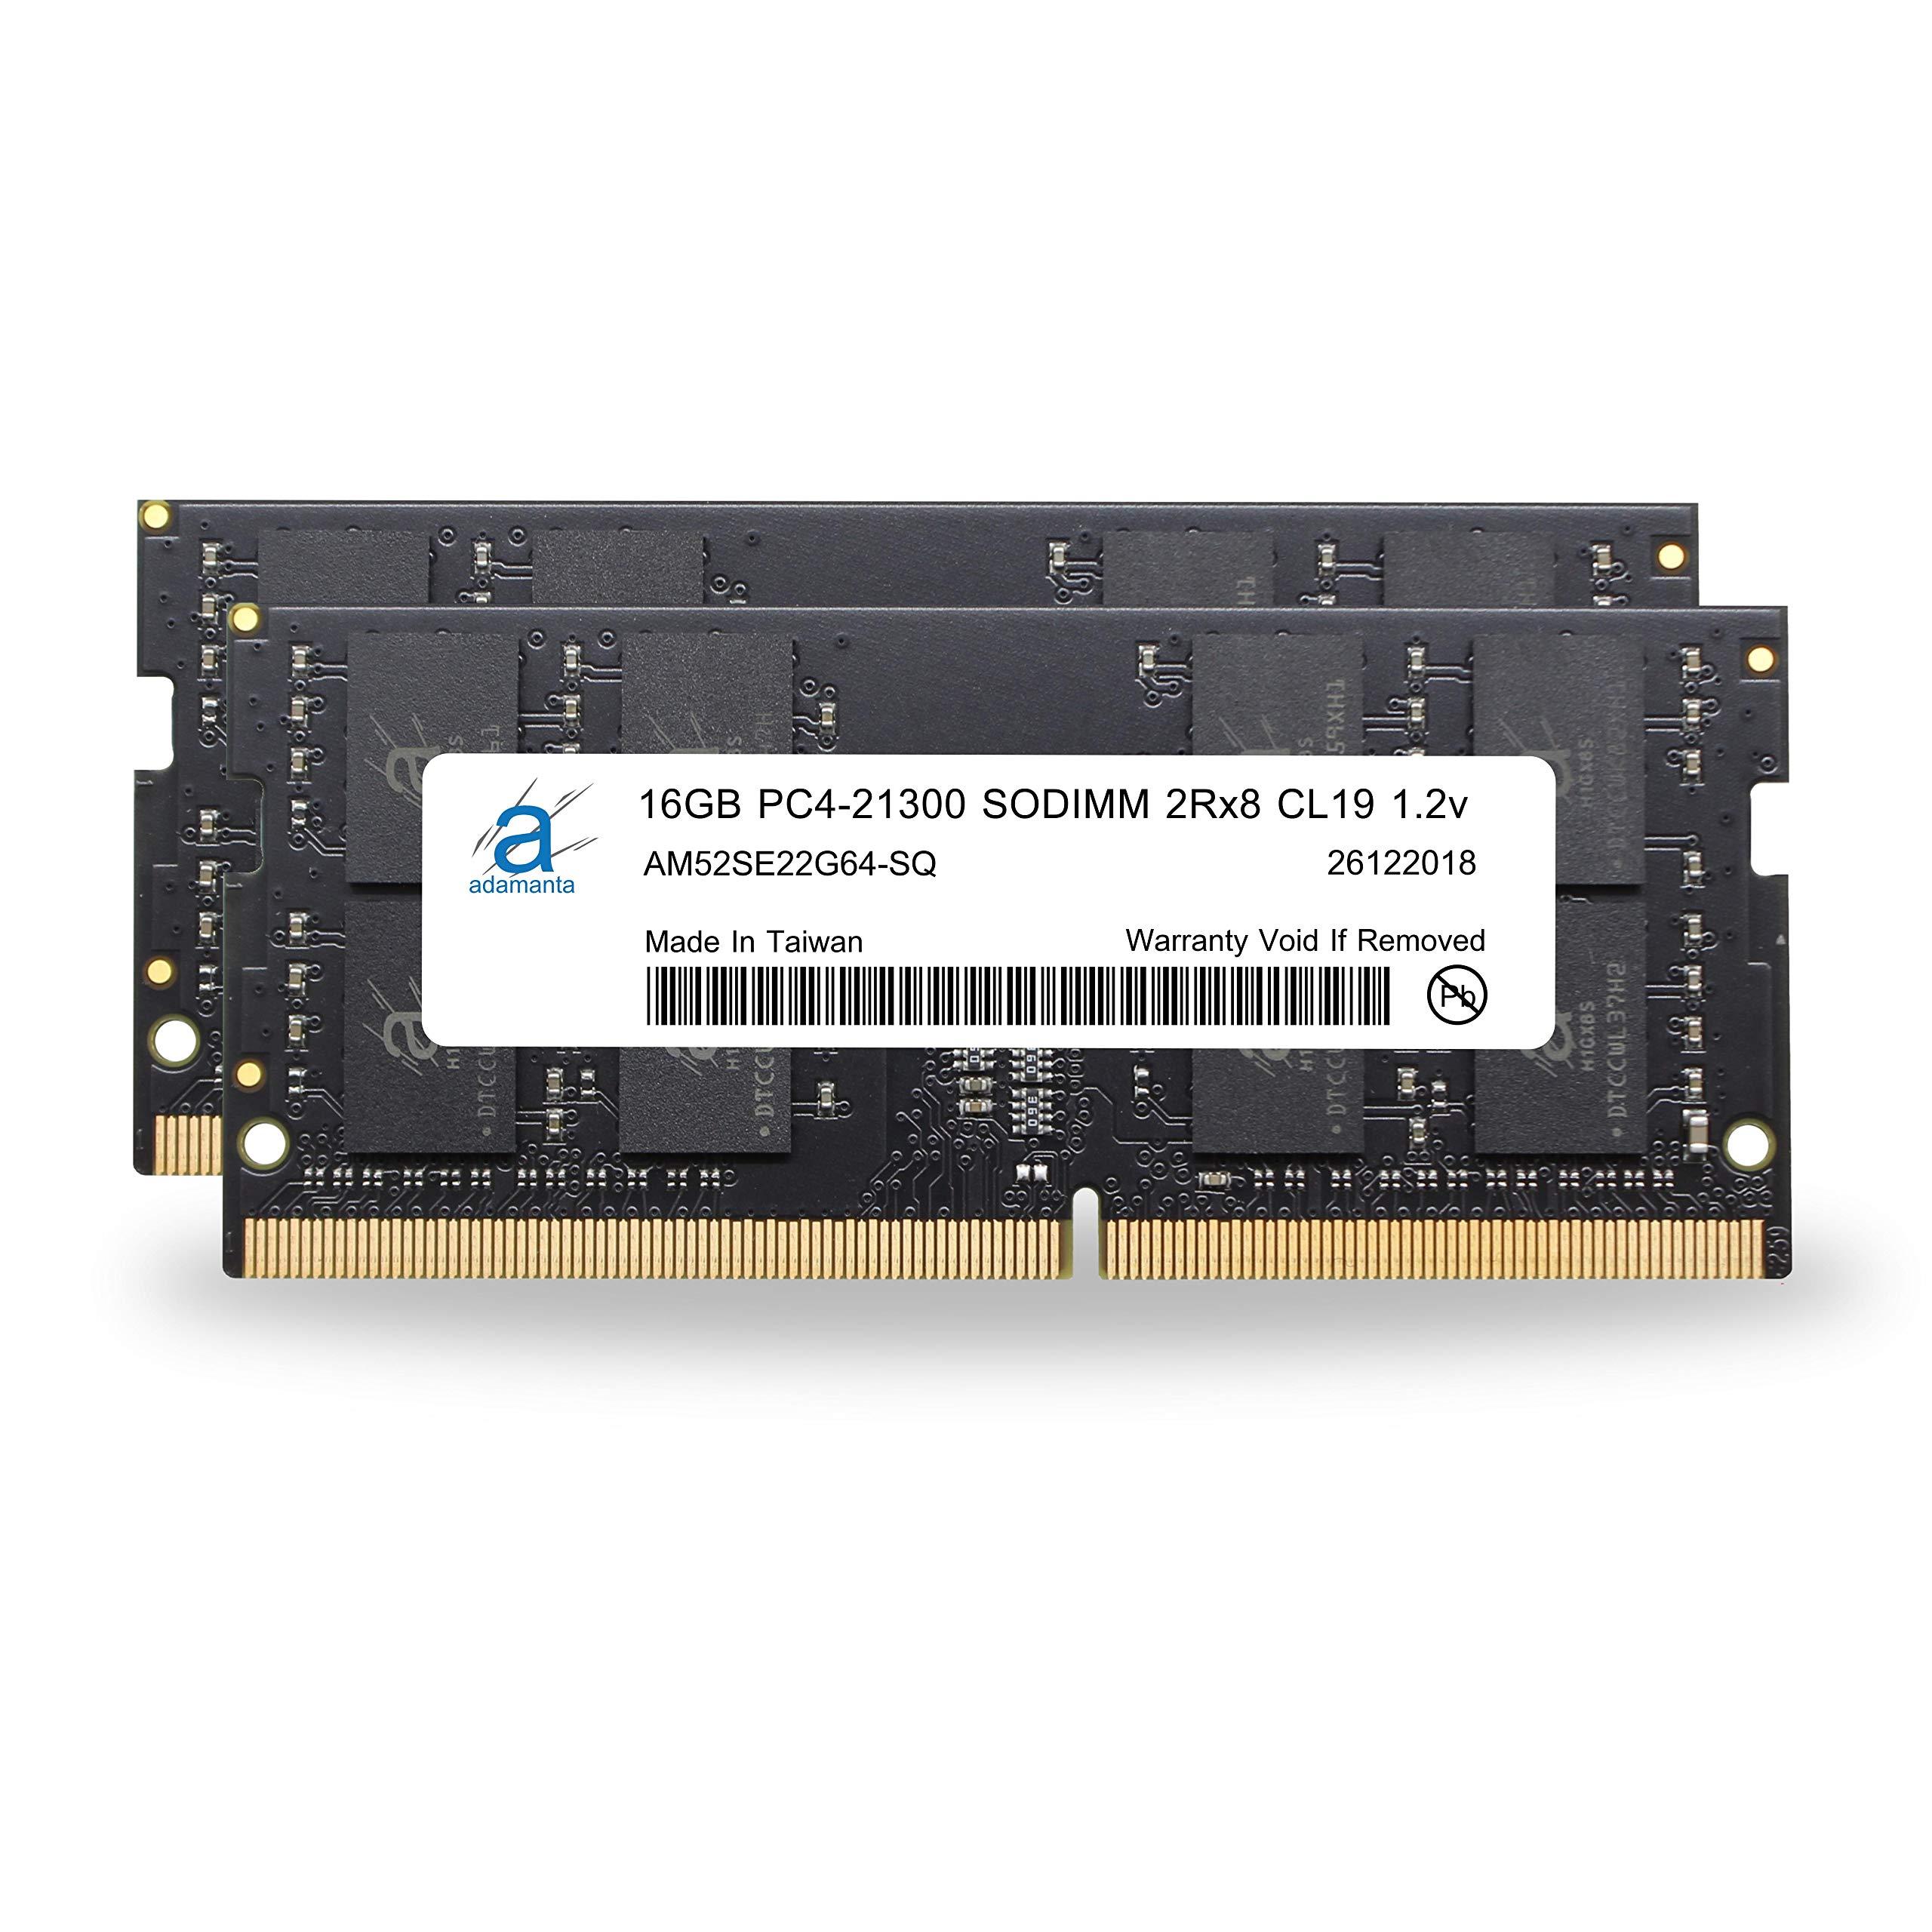 Adamanta 32GB (2x16GB) Memory Upgrade for 2019 Apple iMac 27'' w/Retina 5K Display, Late 2018 Apple Mac Mini DDR4 2666Mhz PC4-21300 SODIMM 2Rx8 CL19 1.2v DRAM RAM by Adamanta